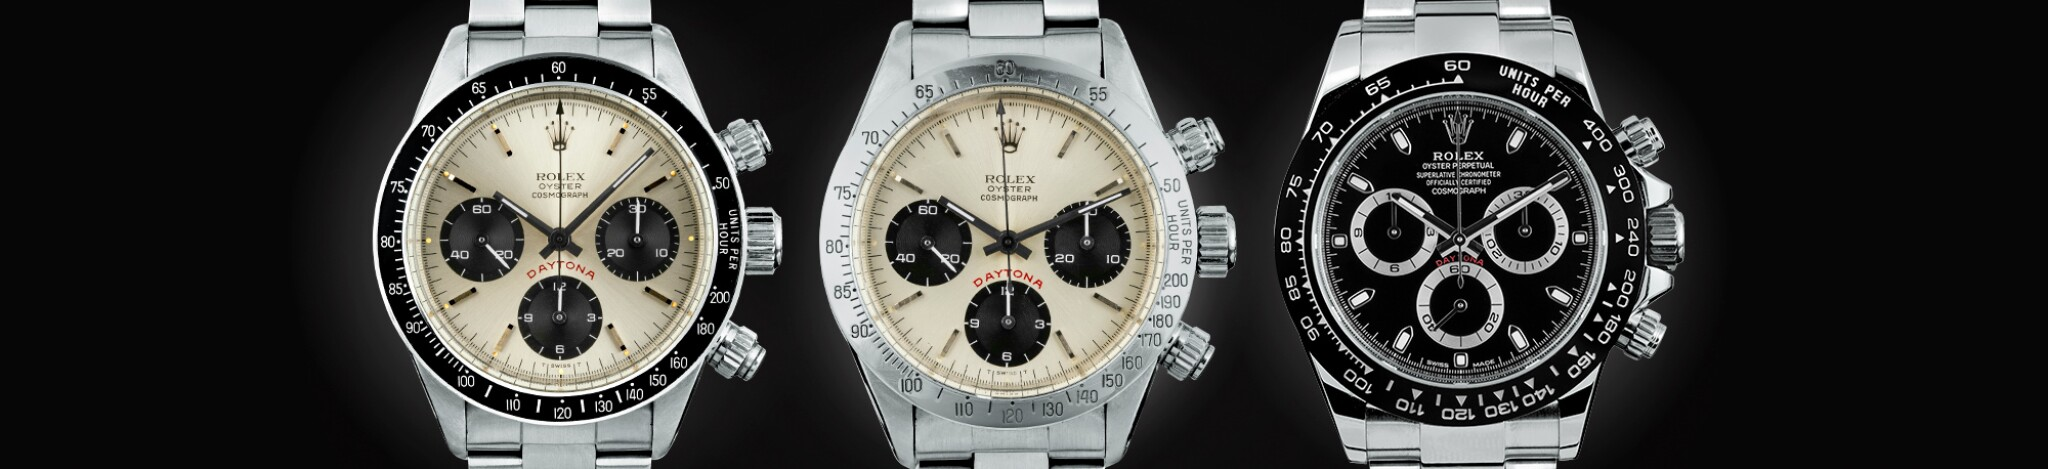 The Rolex Daytona Capsule Collection